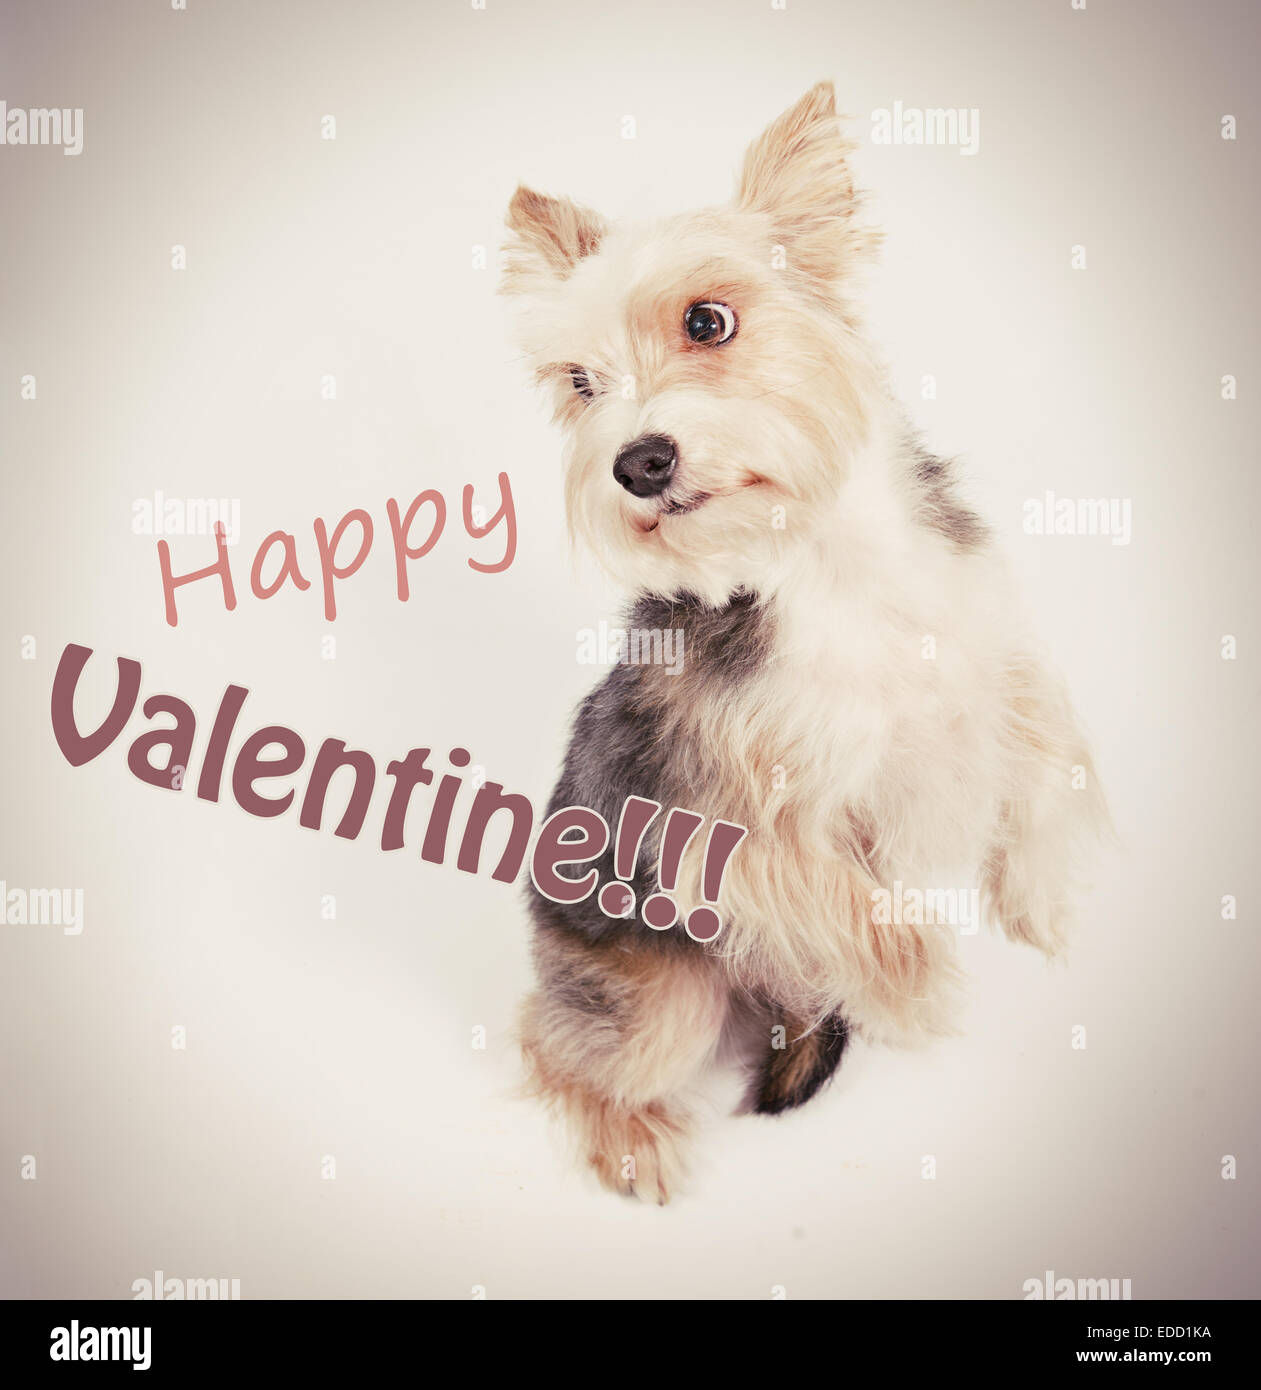 Happy st valentine dog love postcard - Stock Image